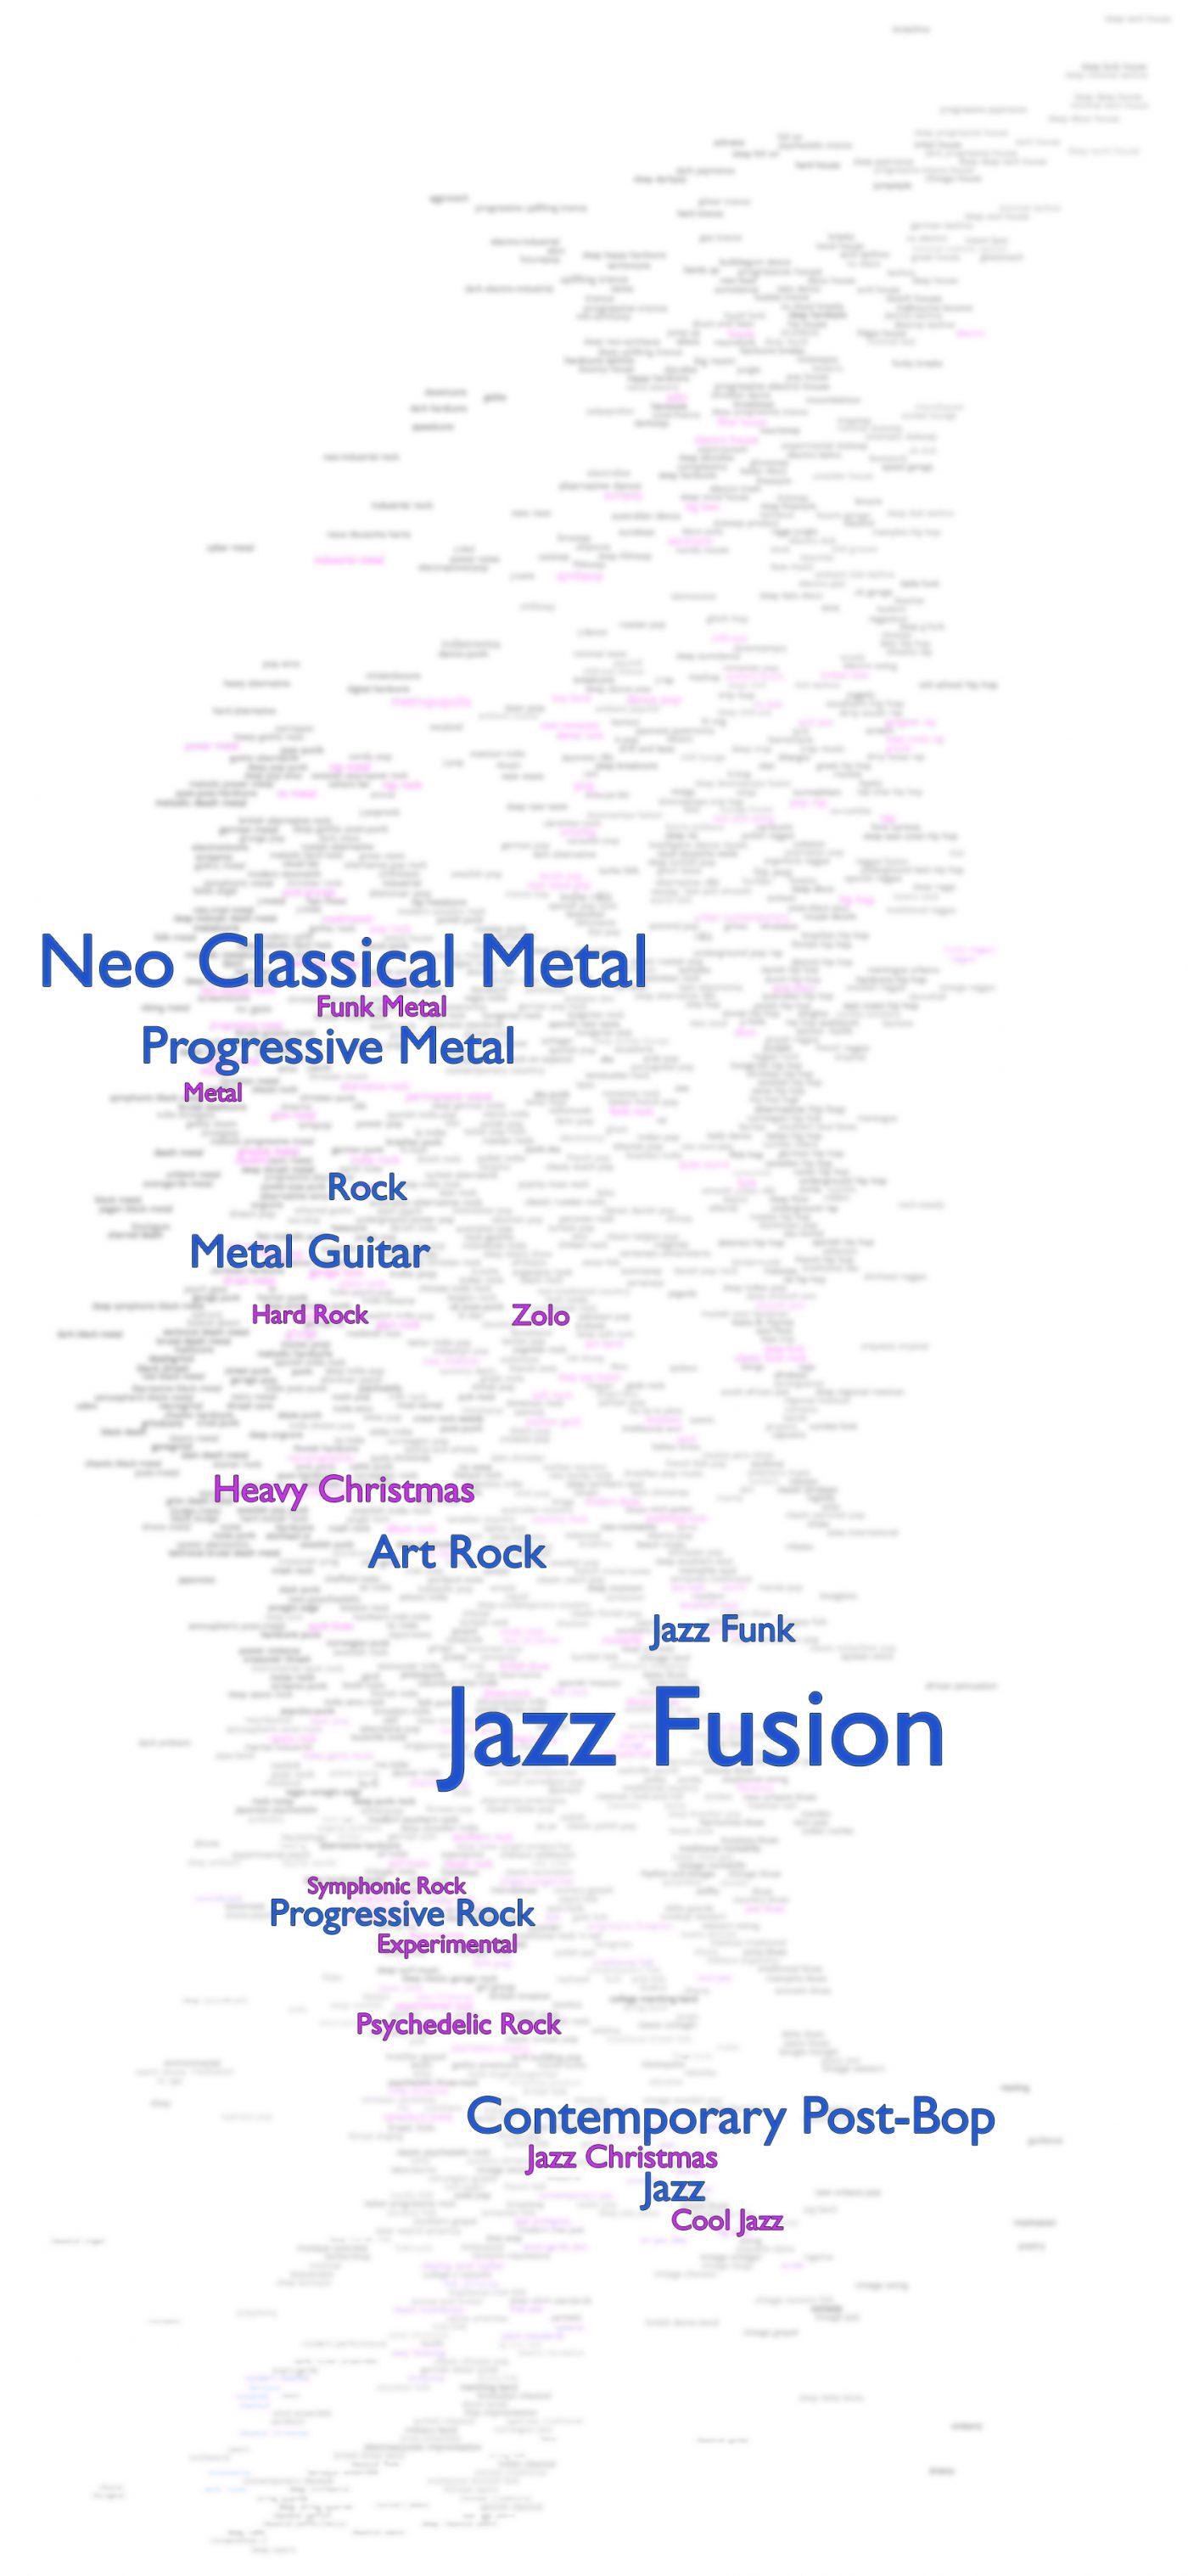 Discovering Musical Identity Neel Ocean